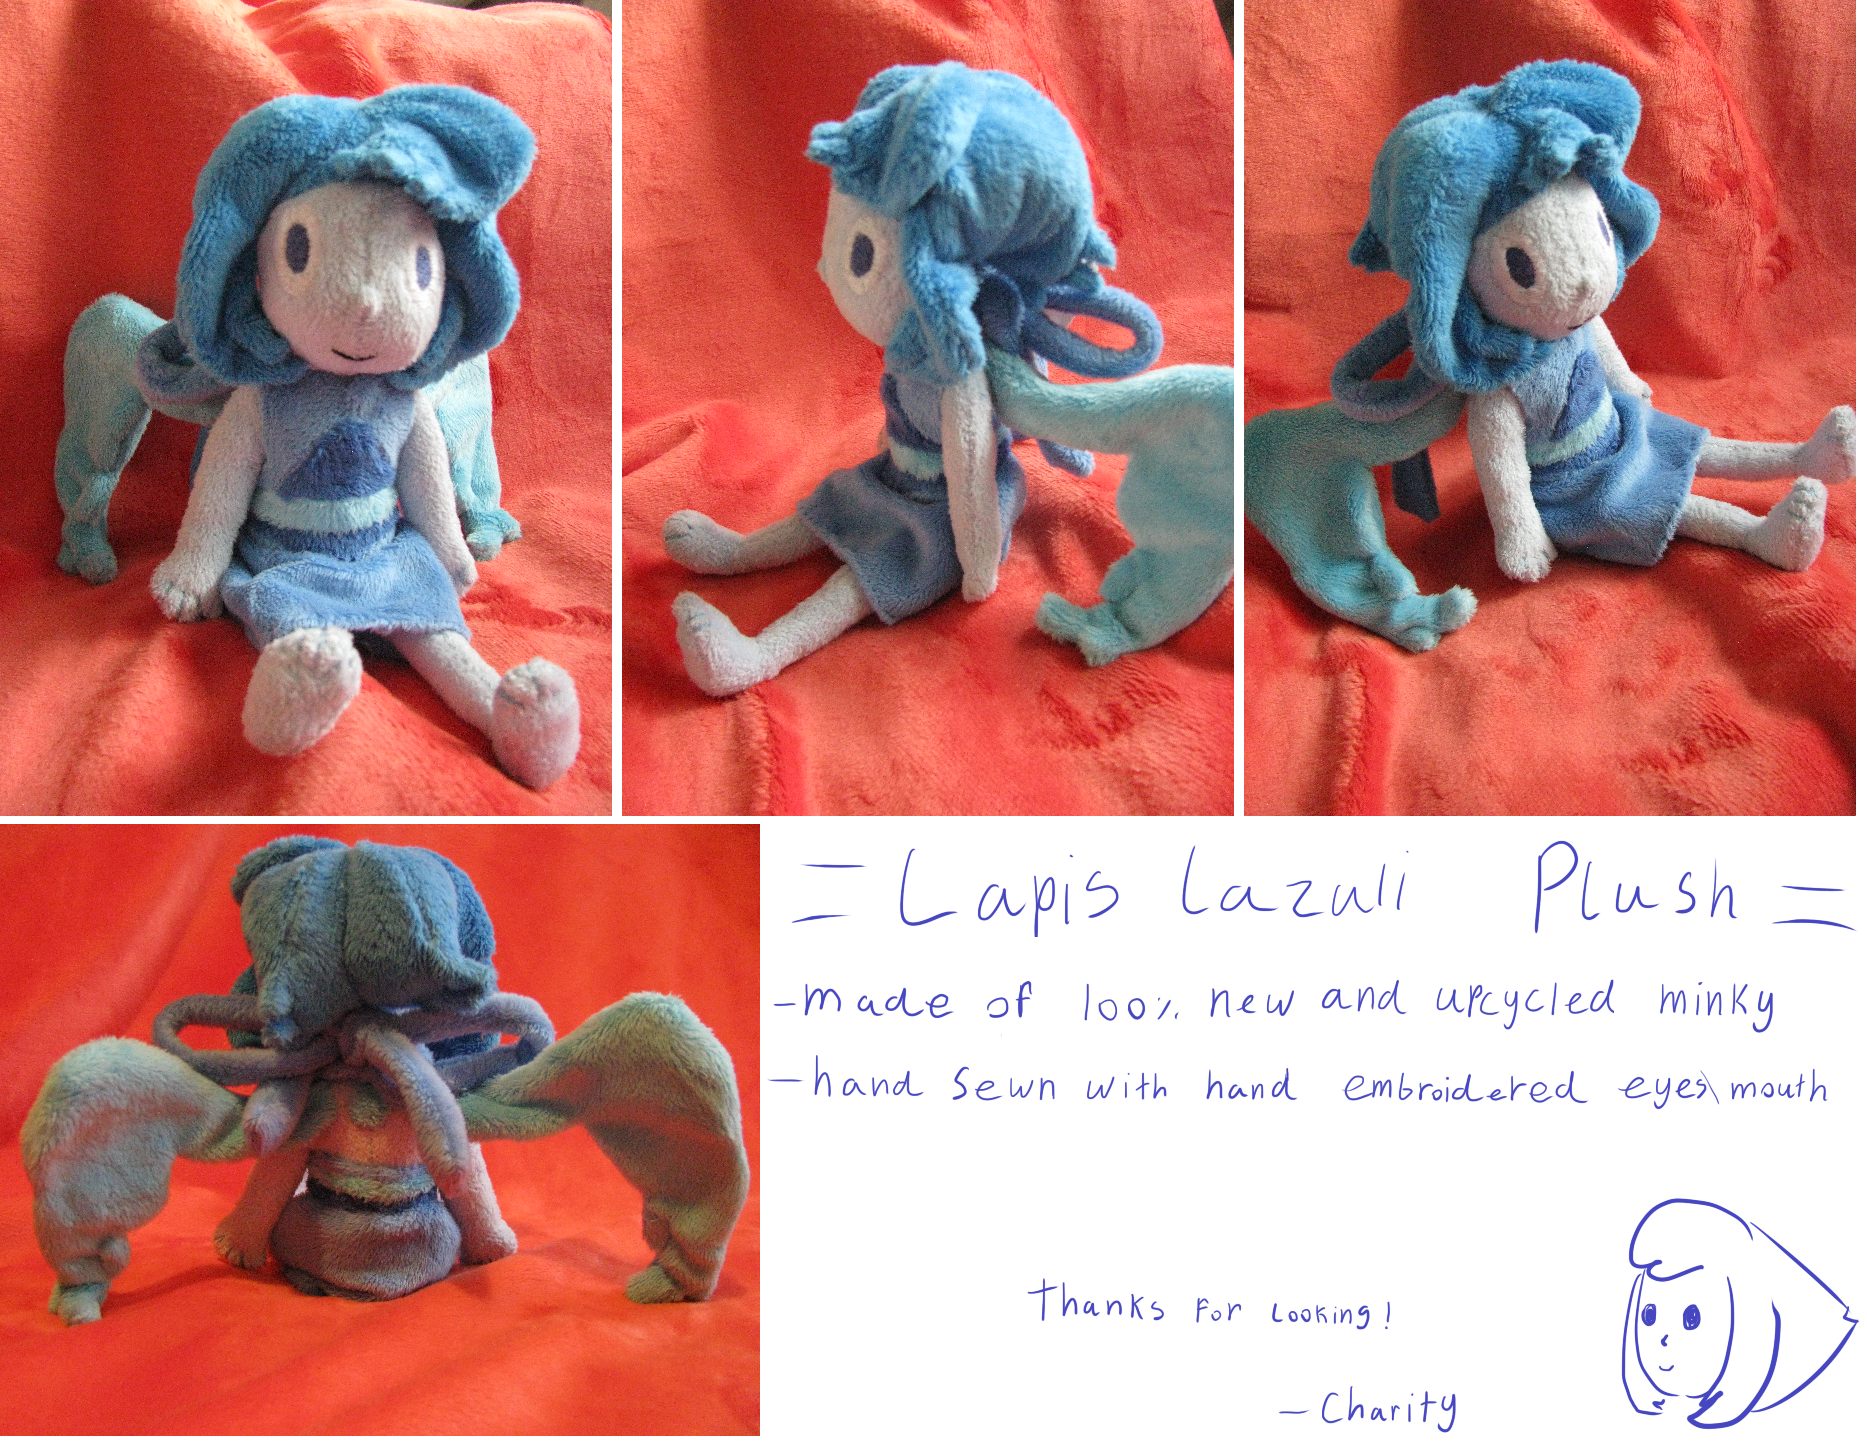 Lapis Lazuli Plush For